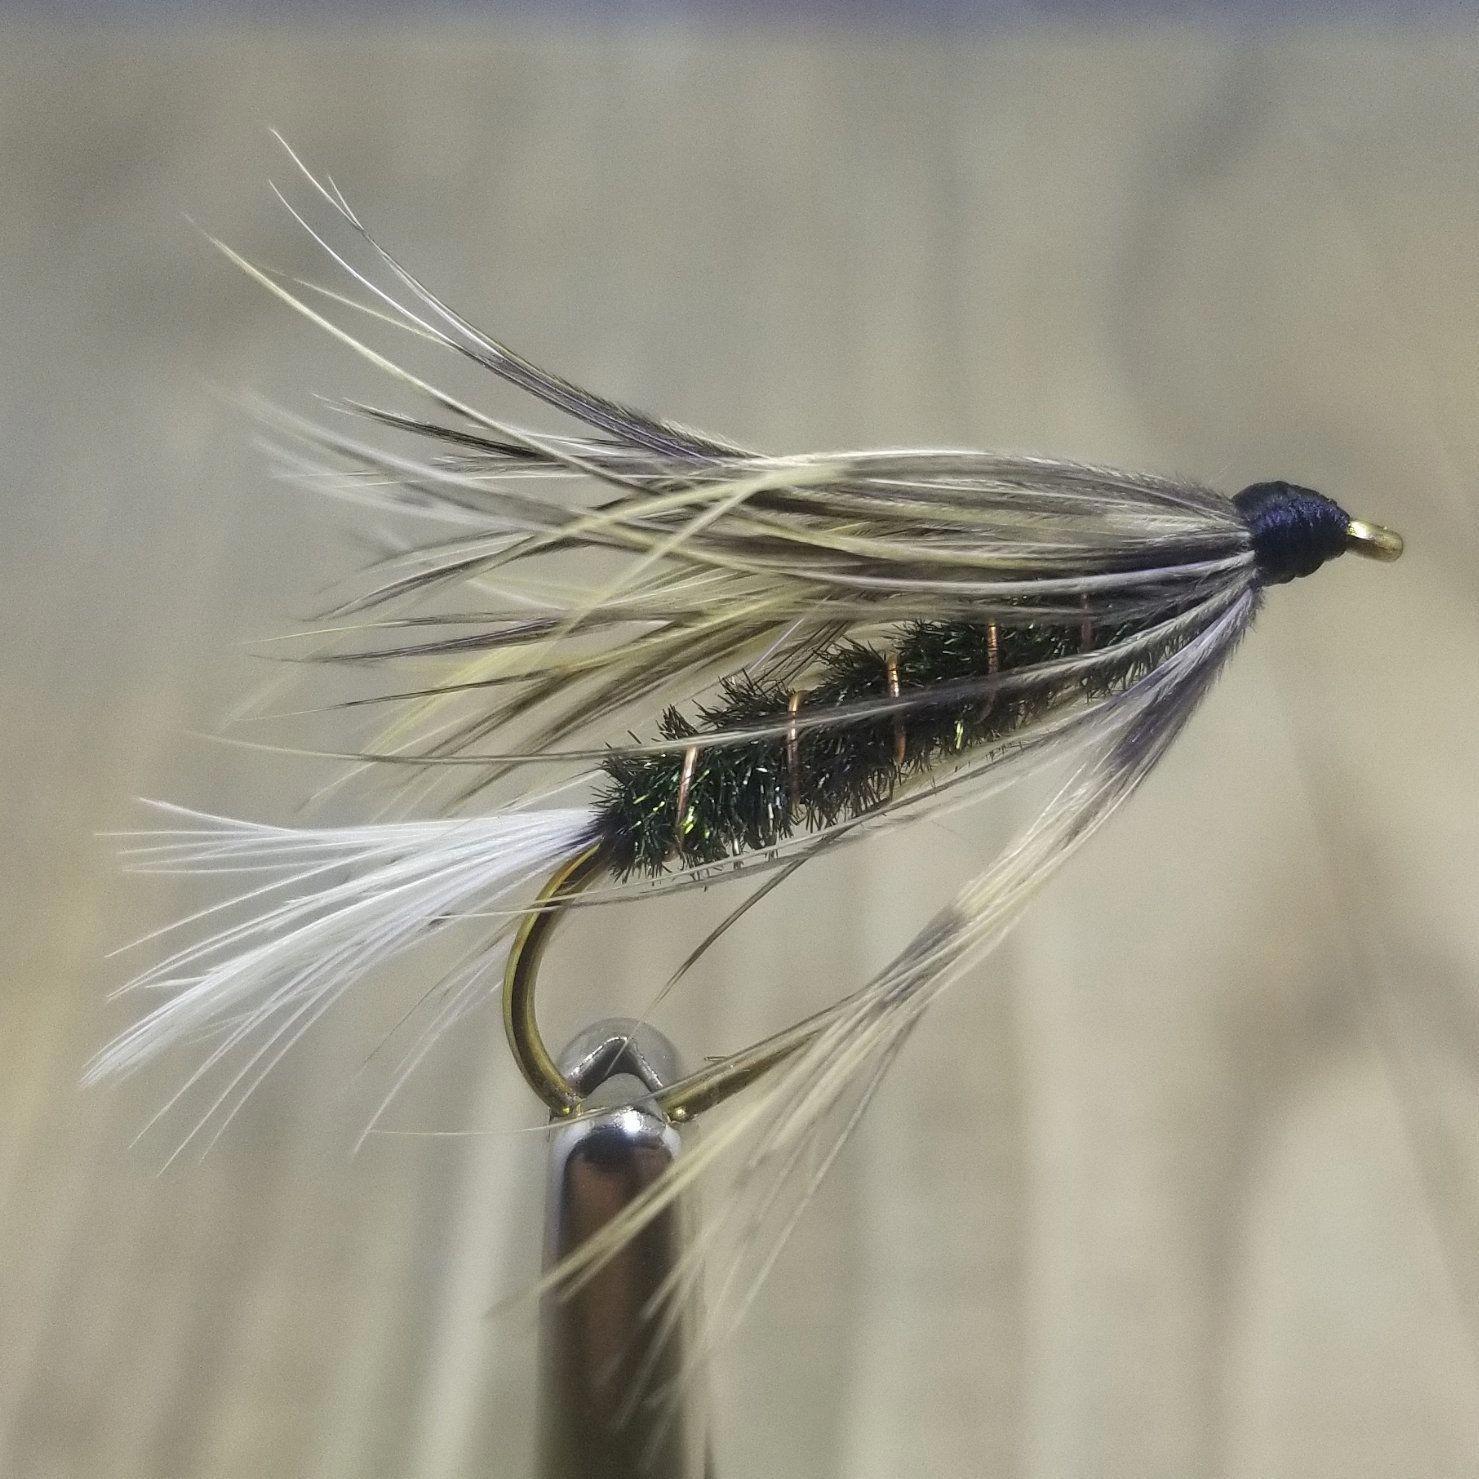 Pin By Joe Wiegand On Fly Fishing Tattoo Fishing Tackle Fly Fishing Flies Trout Fishing Tackle Box